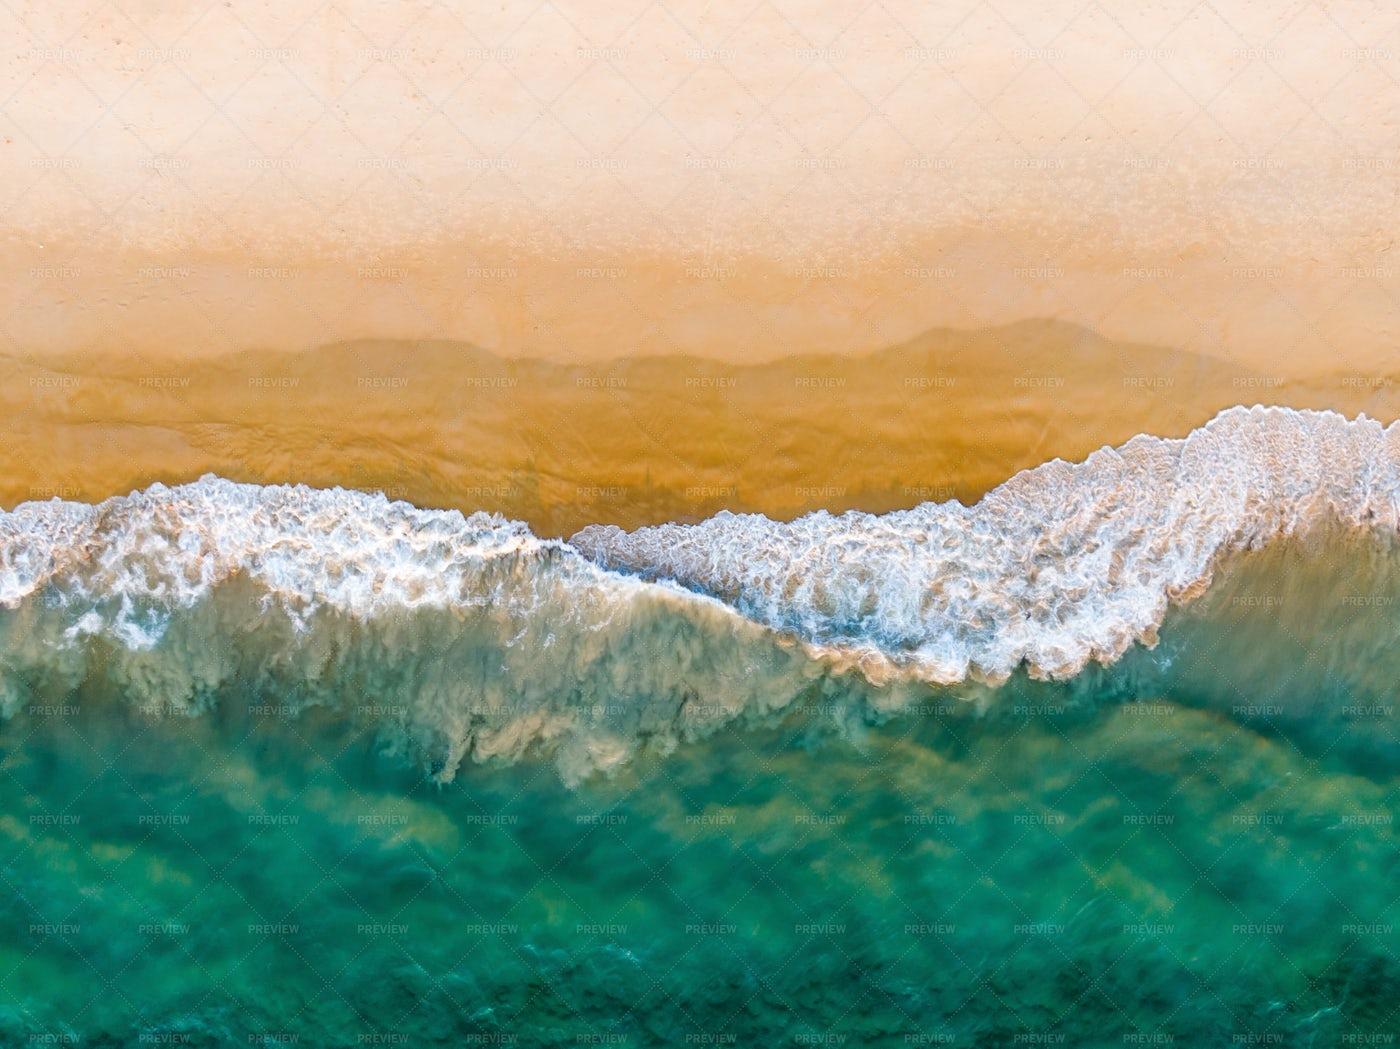 Sandy Beach And Emerald Ocean Top View: Stock Photos